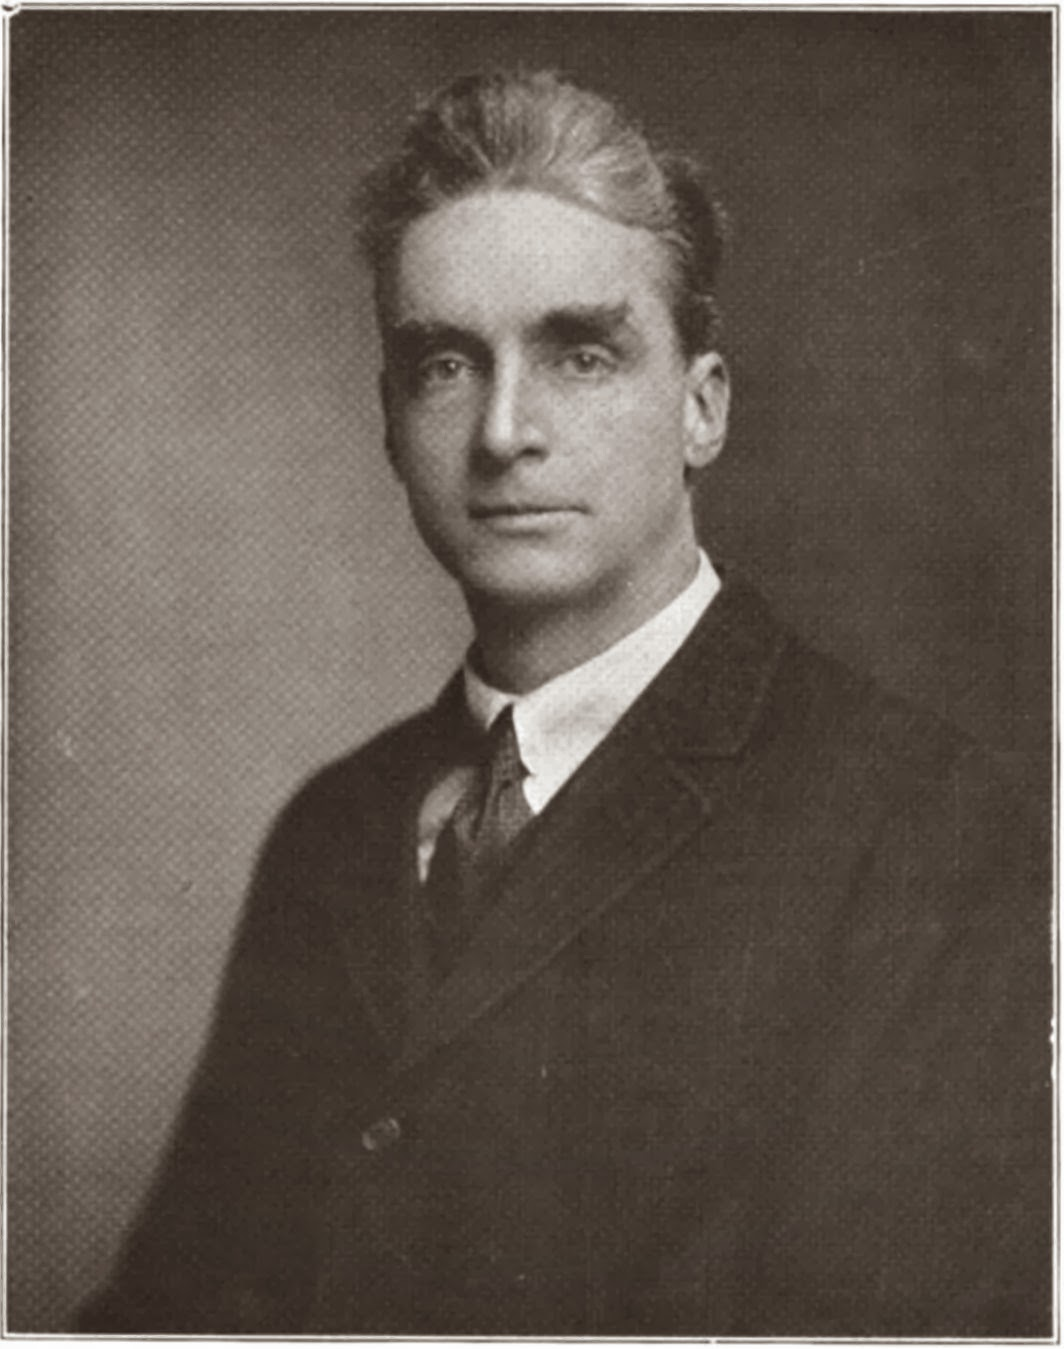 Arthur S. Hoffman, Editor, Adventure Magazine c. 1920